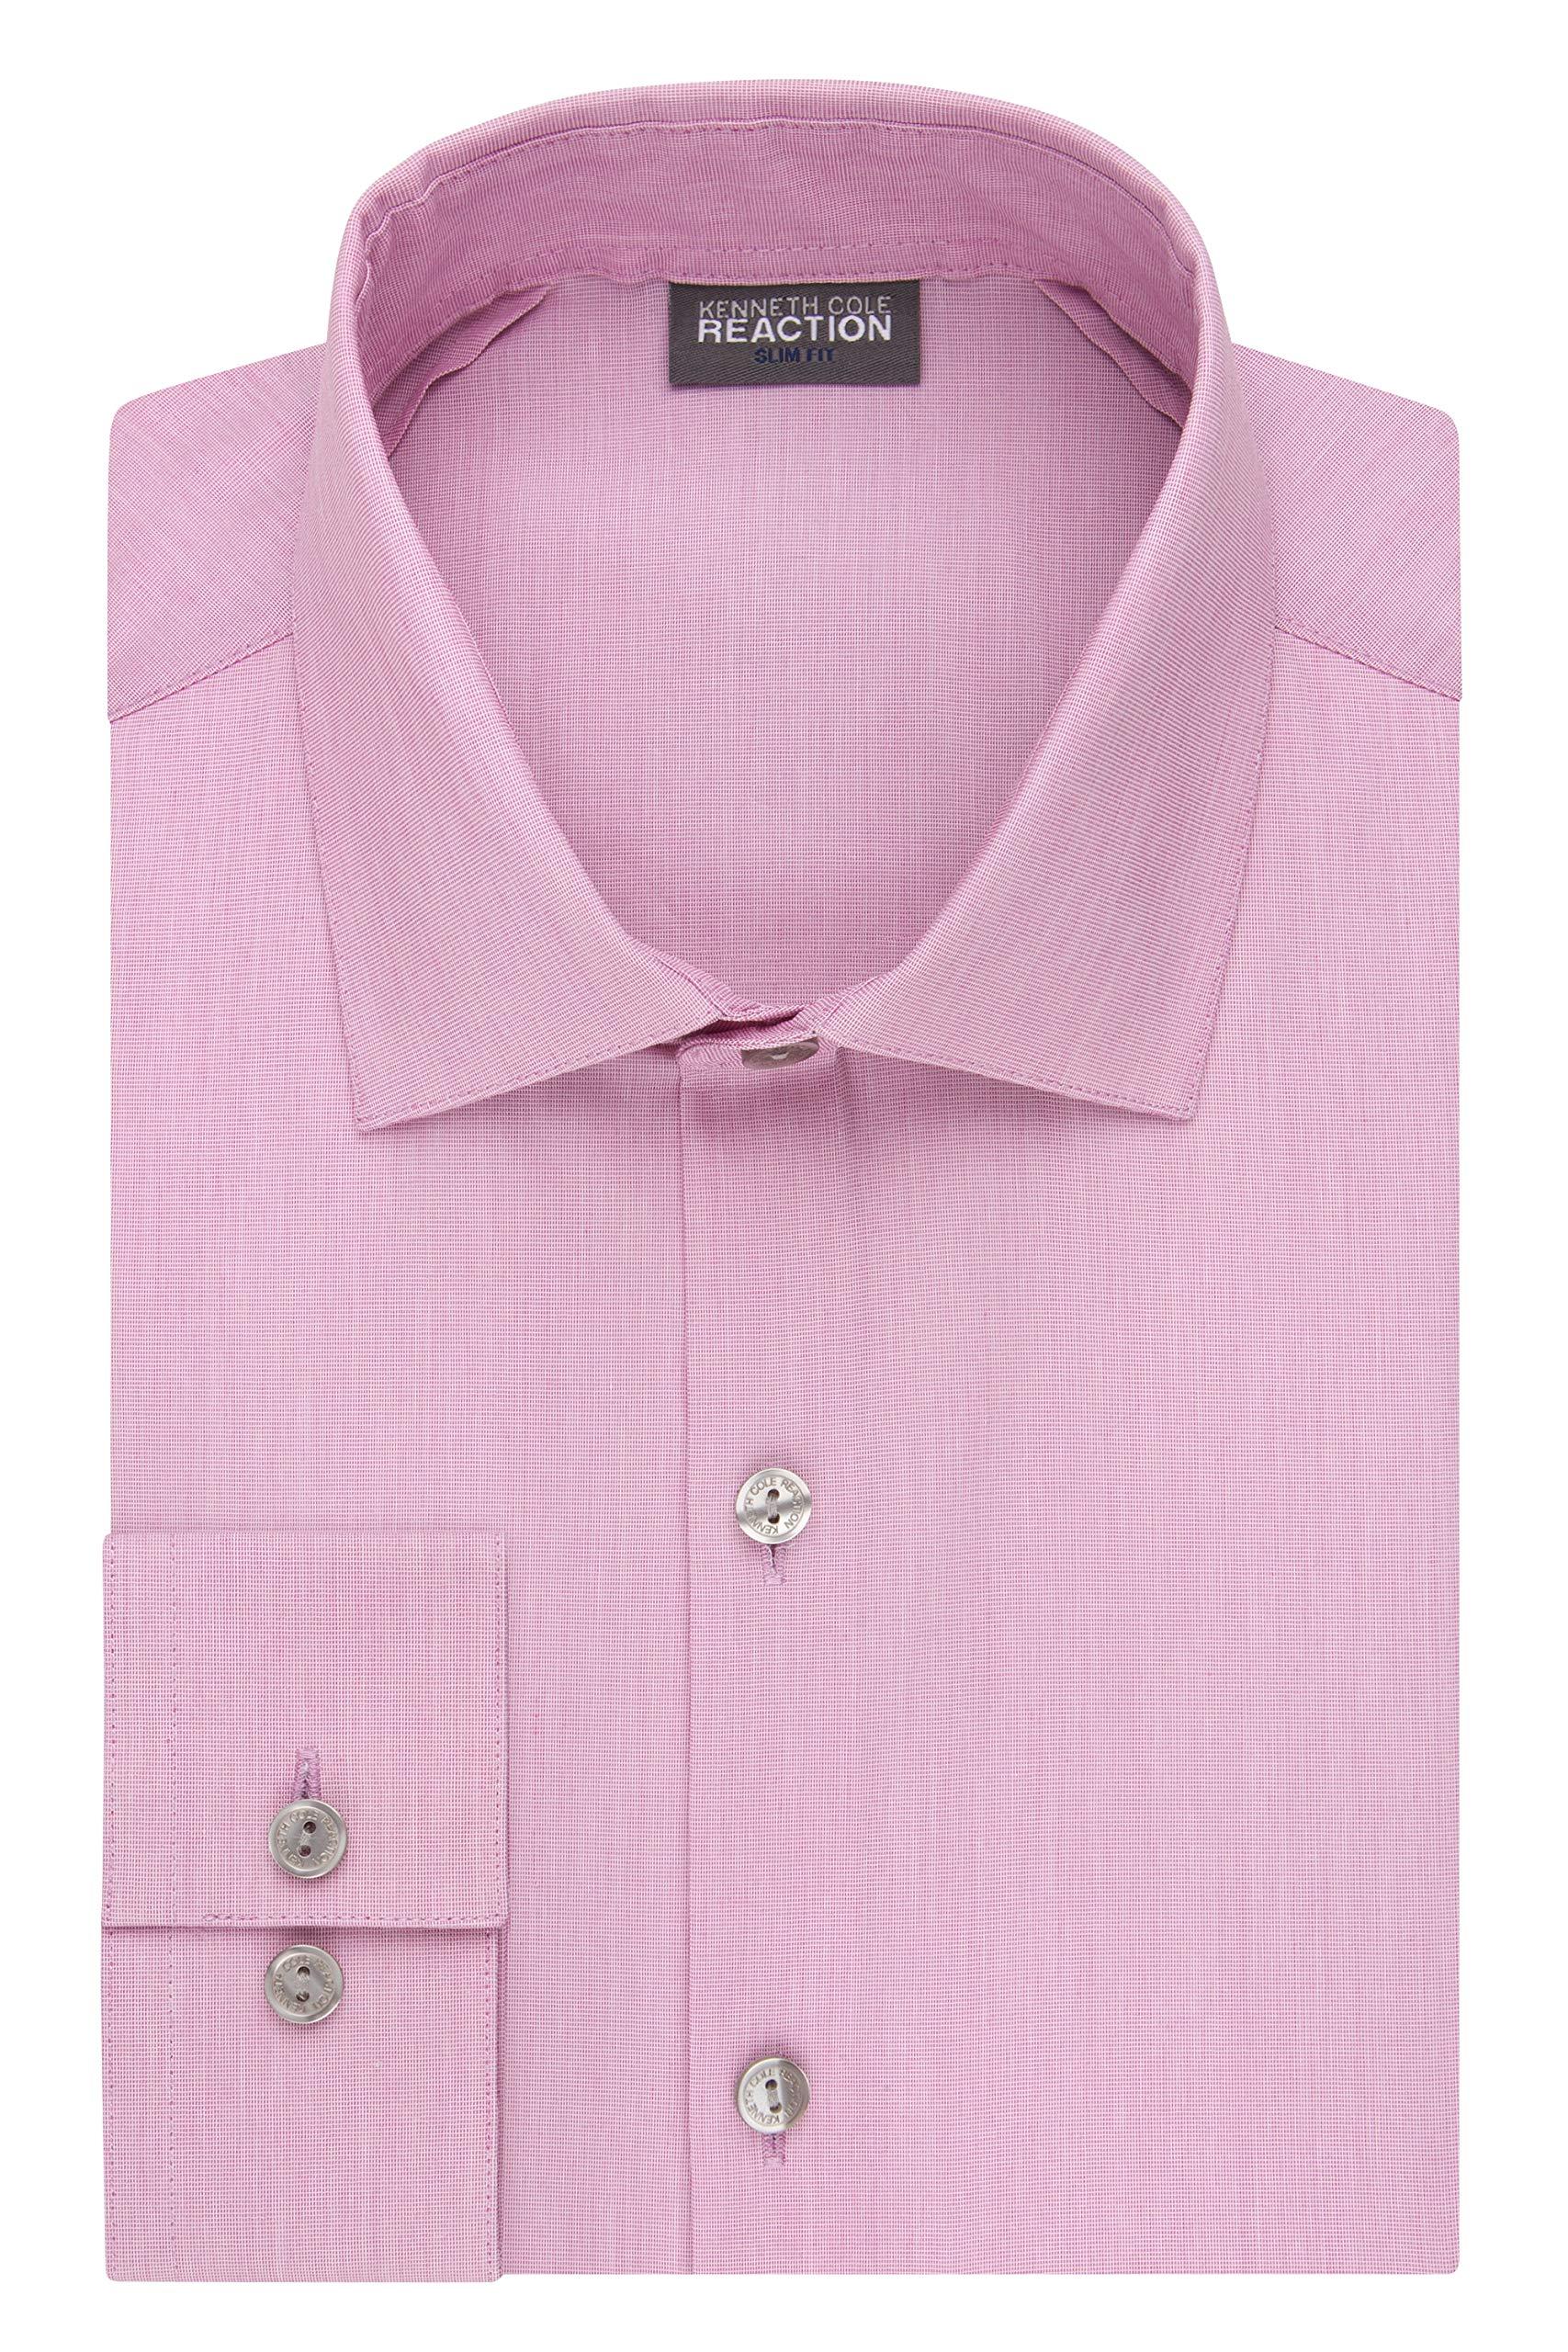 Kenneth Cole REACTION Men's Dress Shirt Slim Fit Technicole Stretch Solid